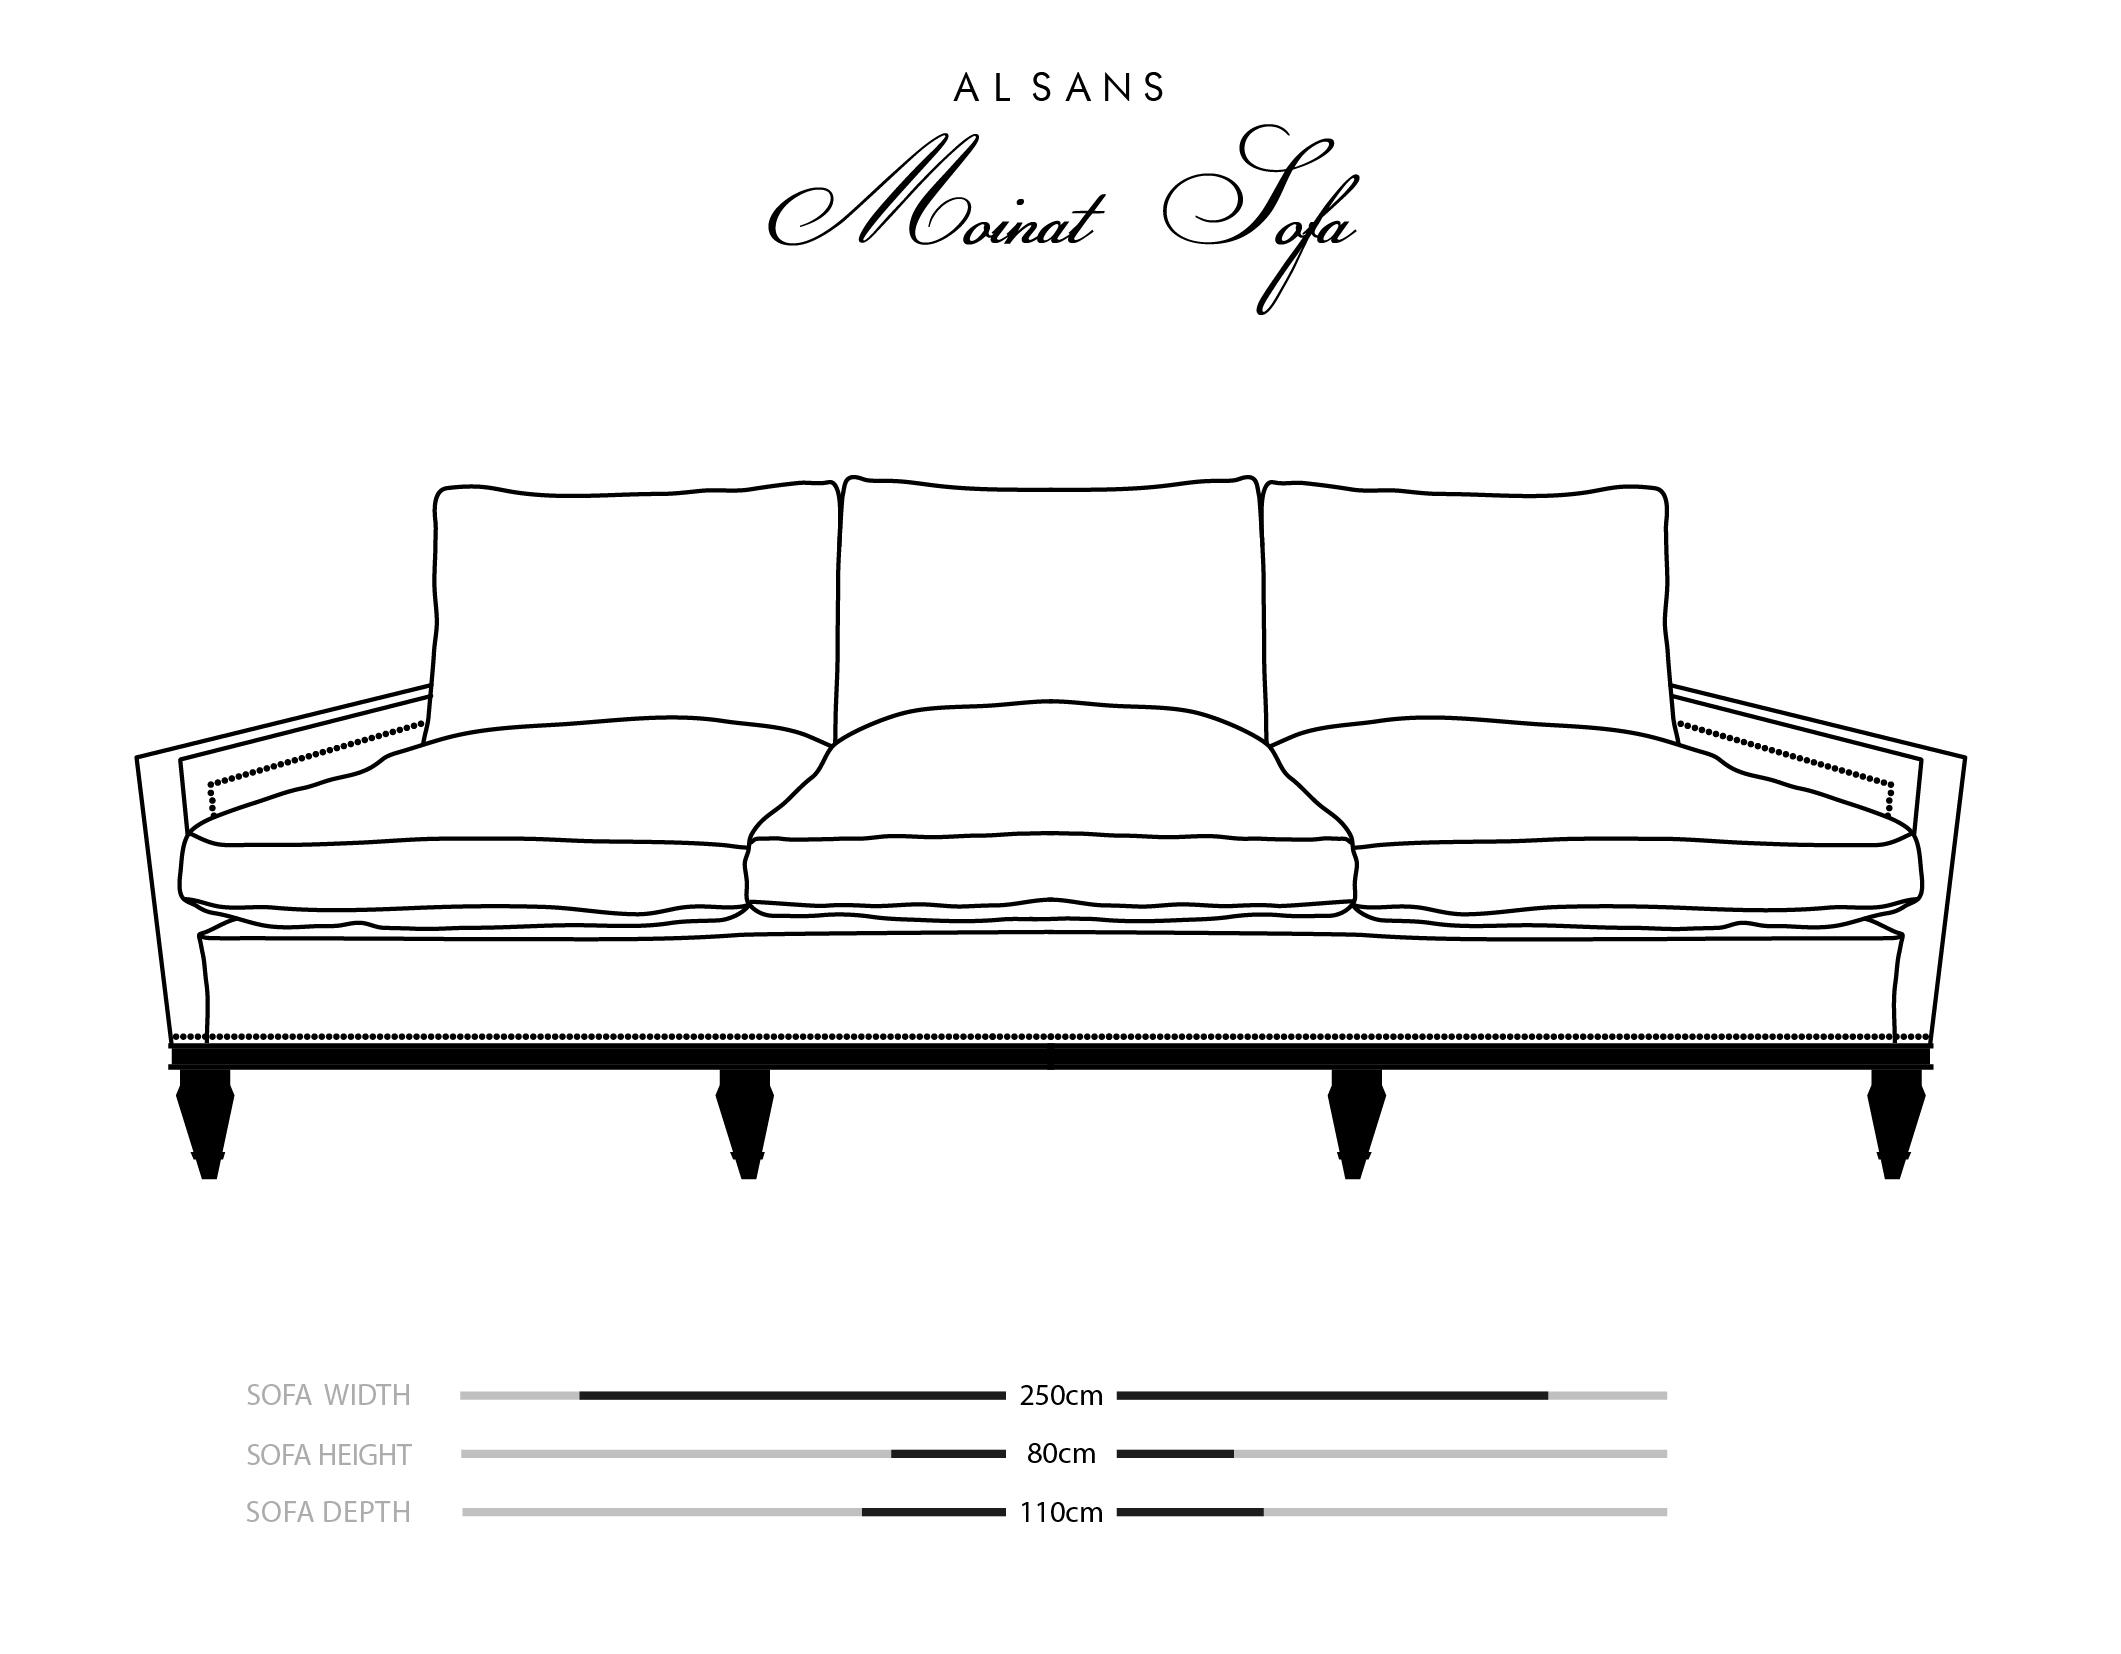 Moinat Sofa Dimensions